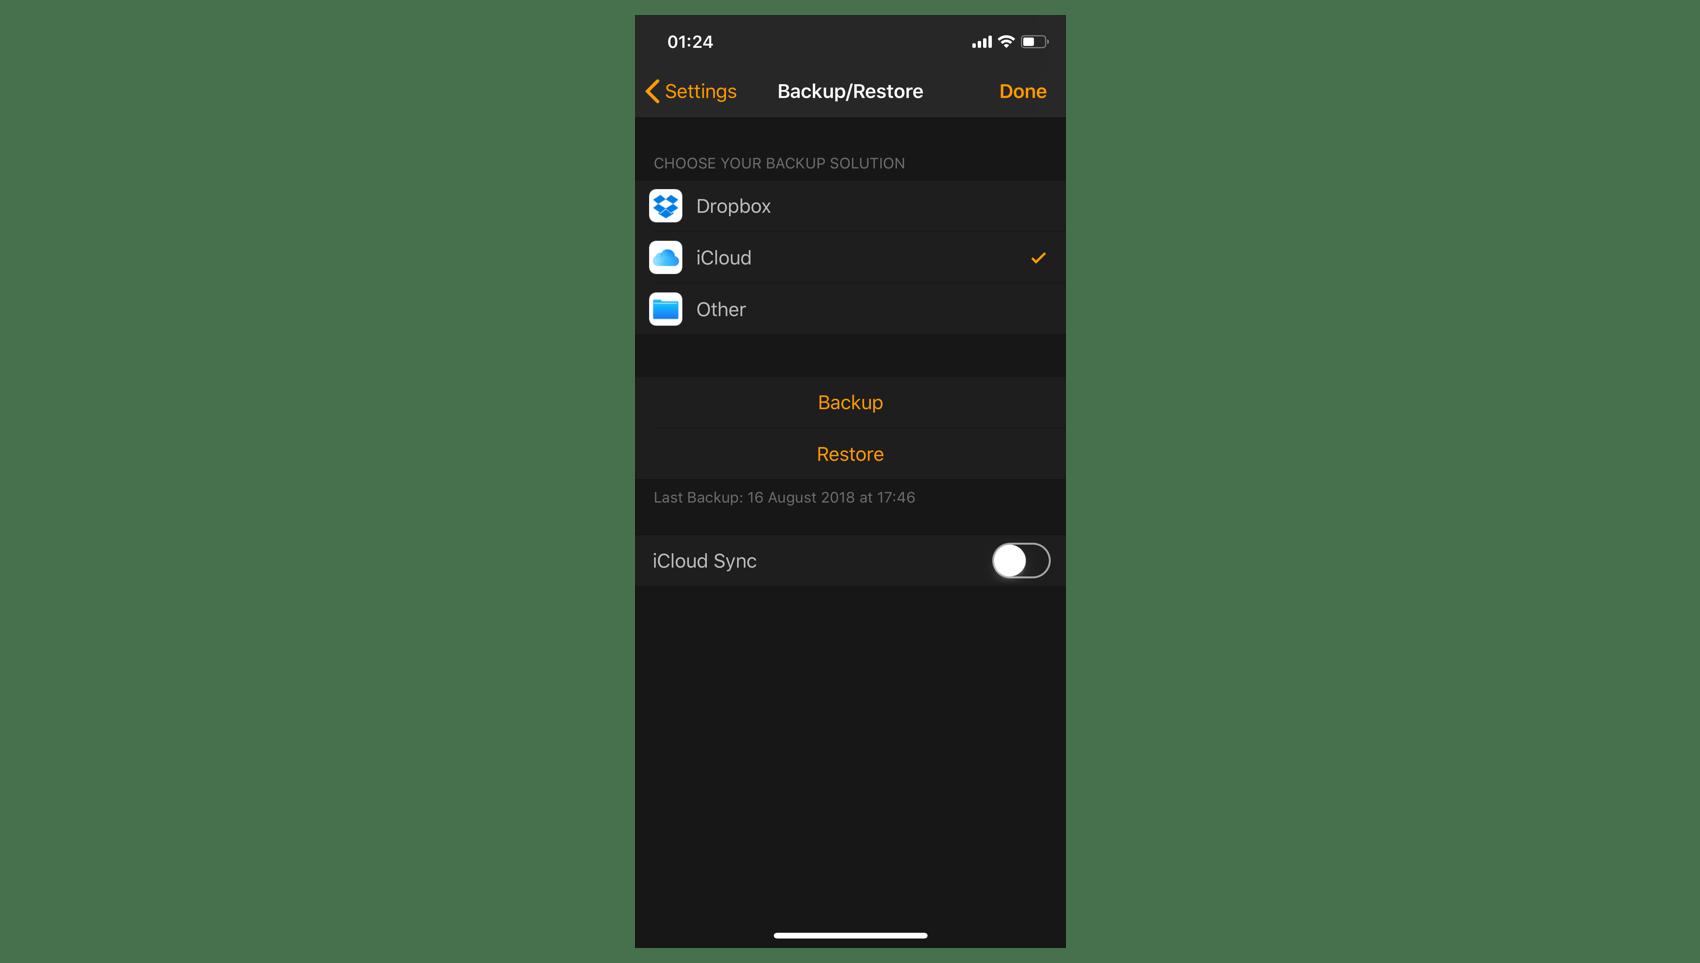 iOS Backup/Restore